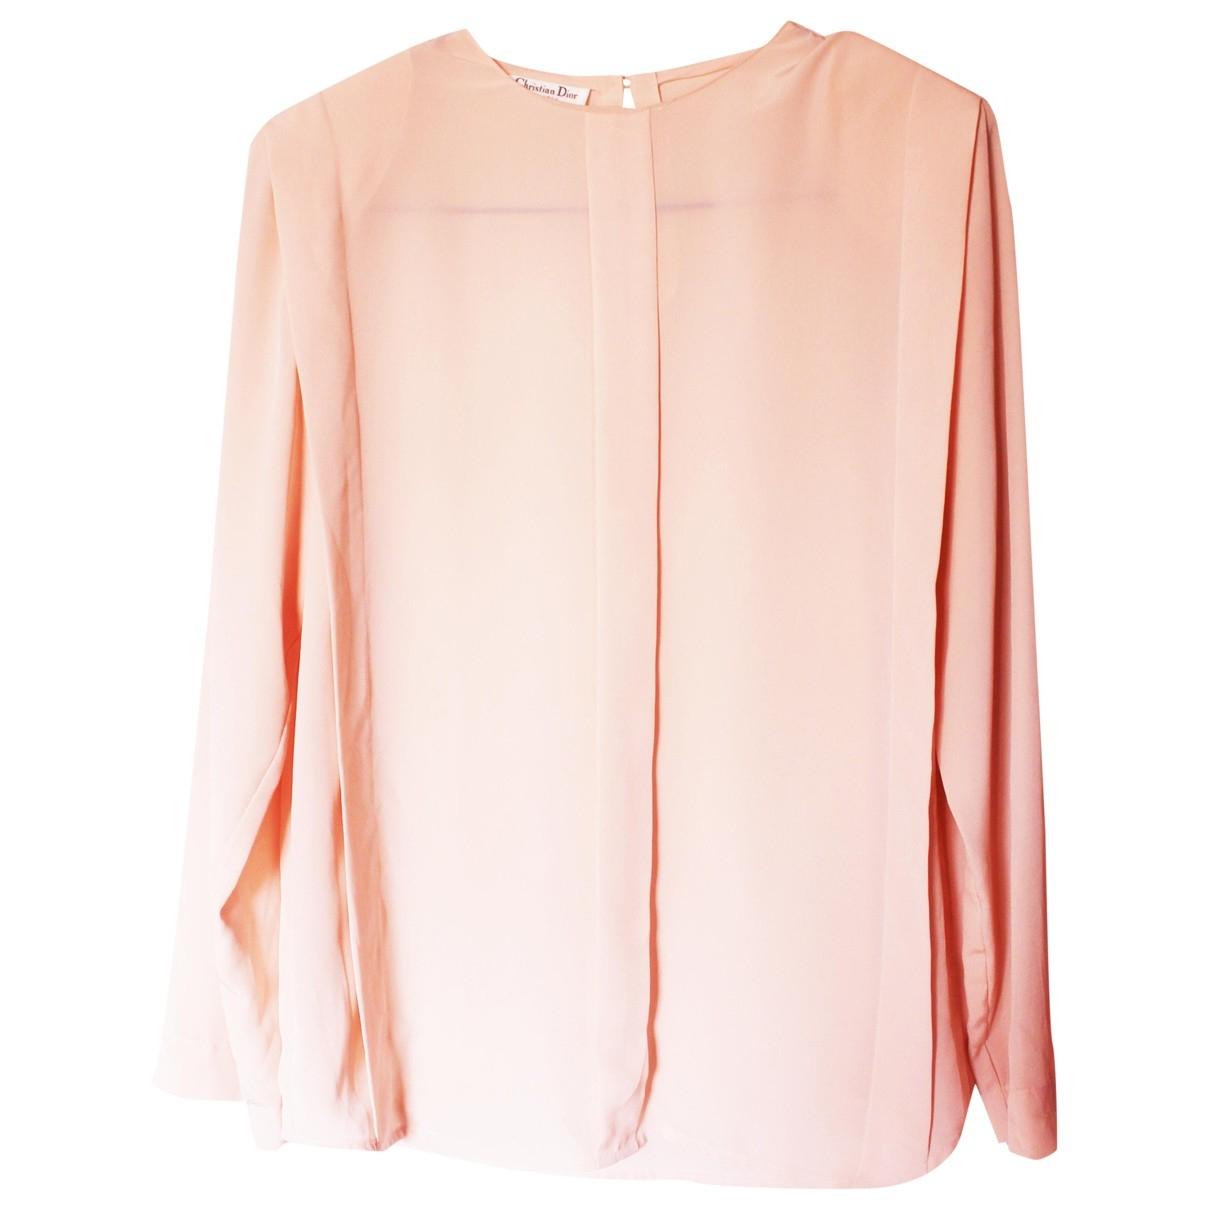 Dior \N Pink  top for Women L International